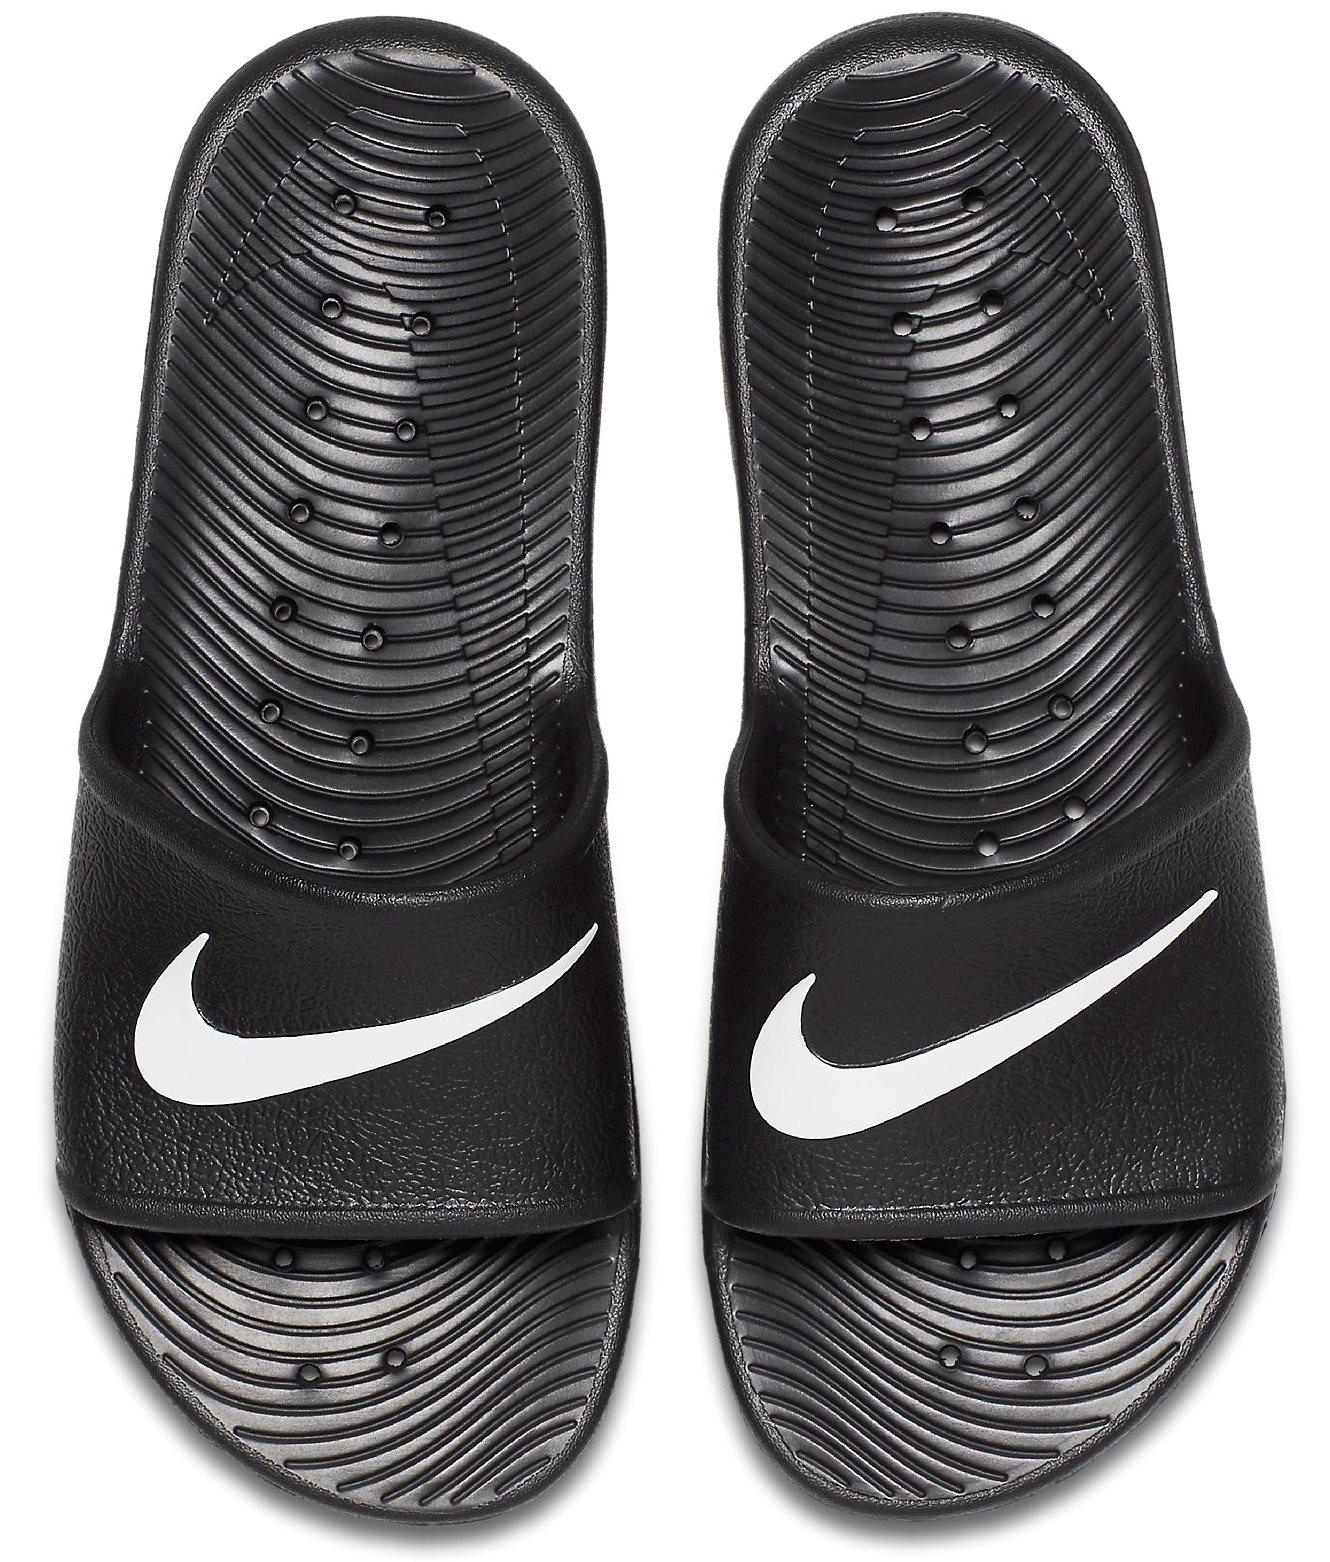 buy popular 25dcd 8408e Nike Nike - Claquettes Kawa Shower Slide - 832528   27,00 € sur Urb..